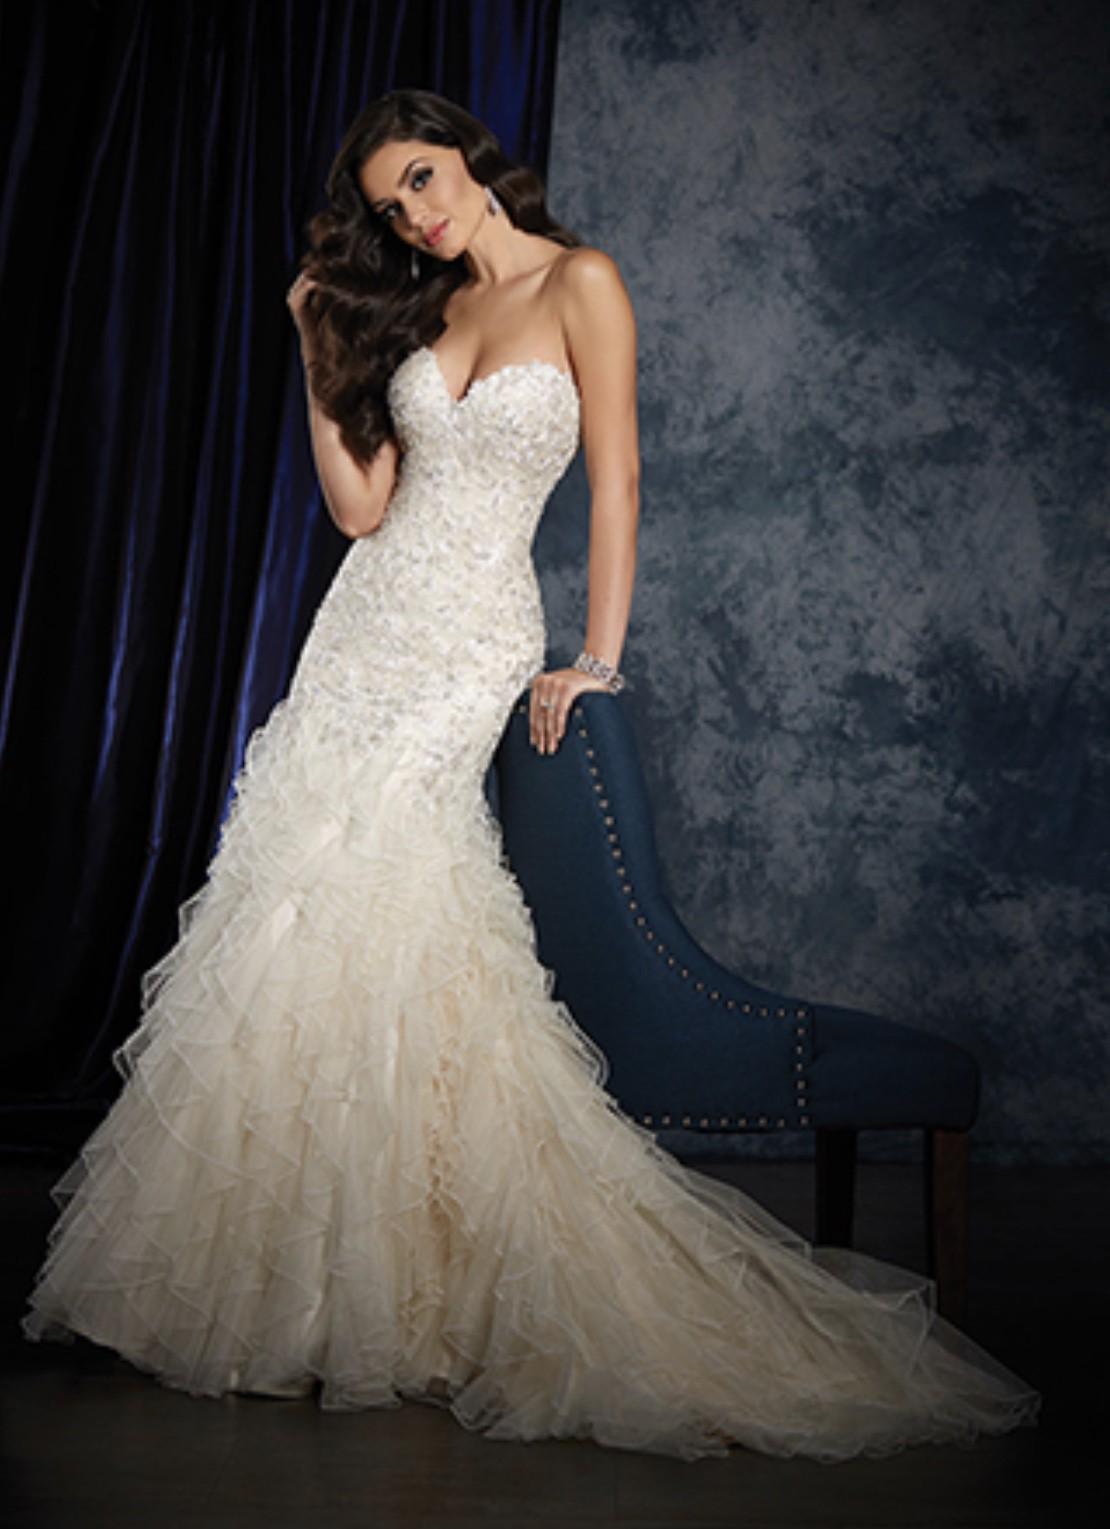 b54755a5d8 Alfred Angelo Wedding Dresses  Designer Wedding Dress